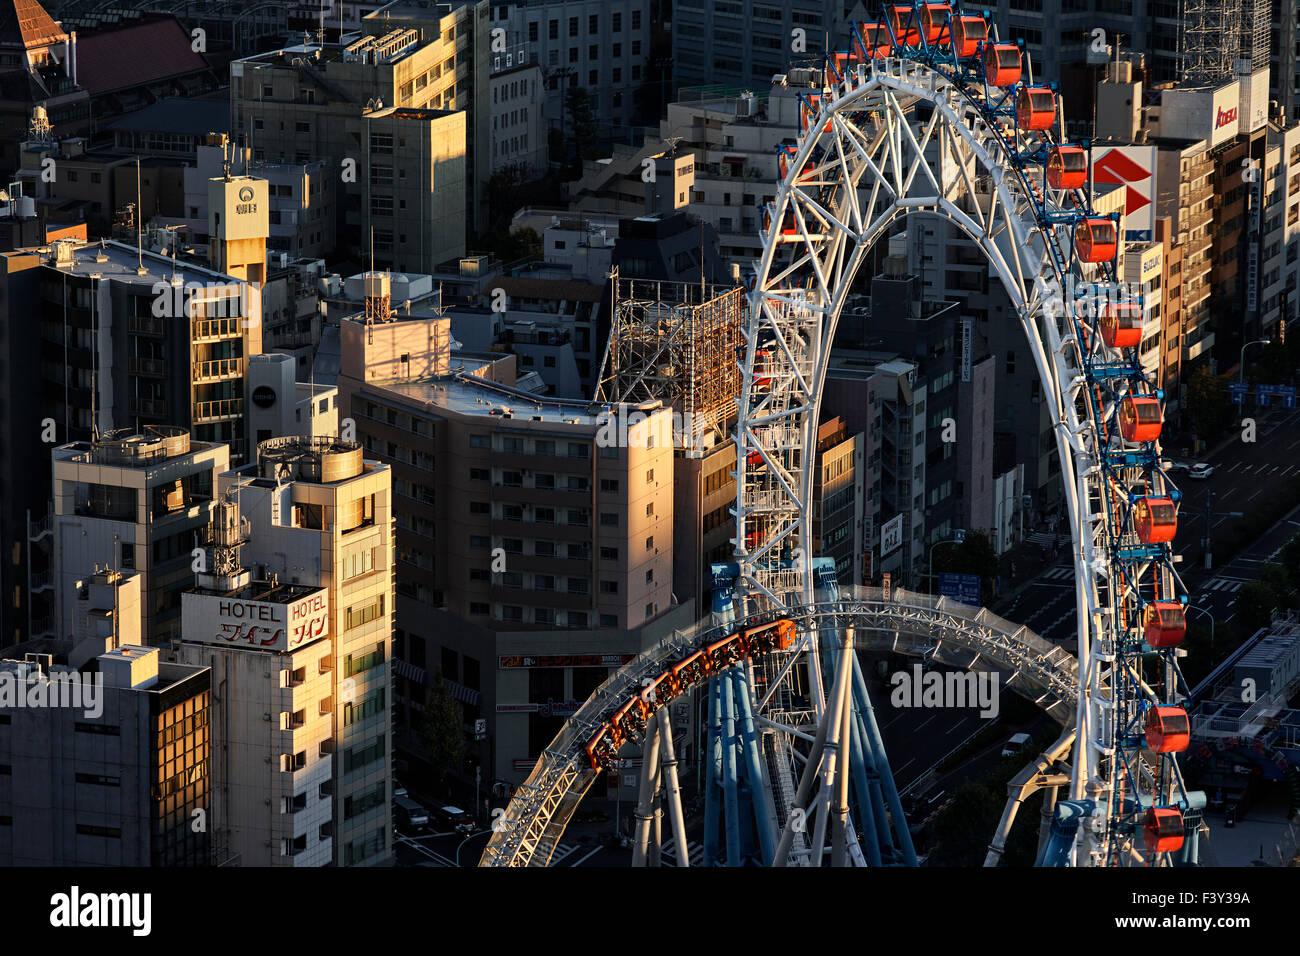 Japan, Insel Honshu, Kanto, Tokio, Vergnügungspark über Gebäude Dächern. Stockbild